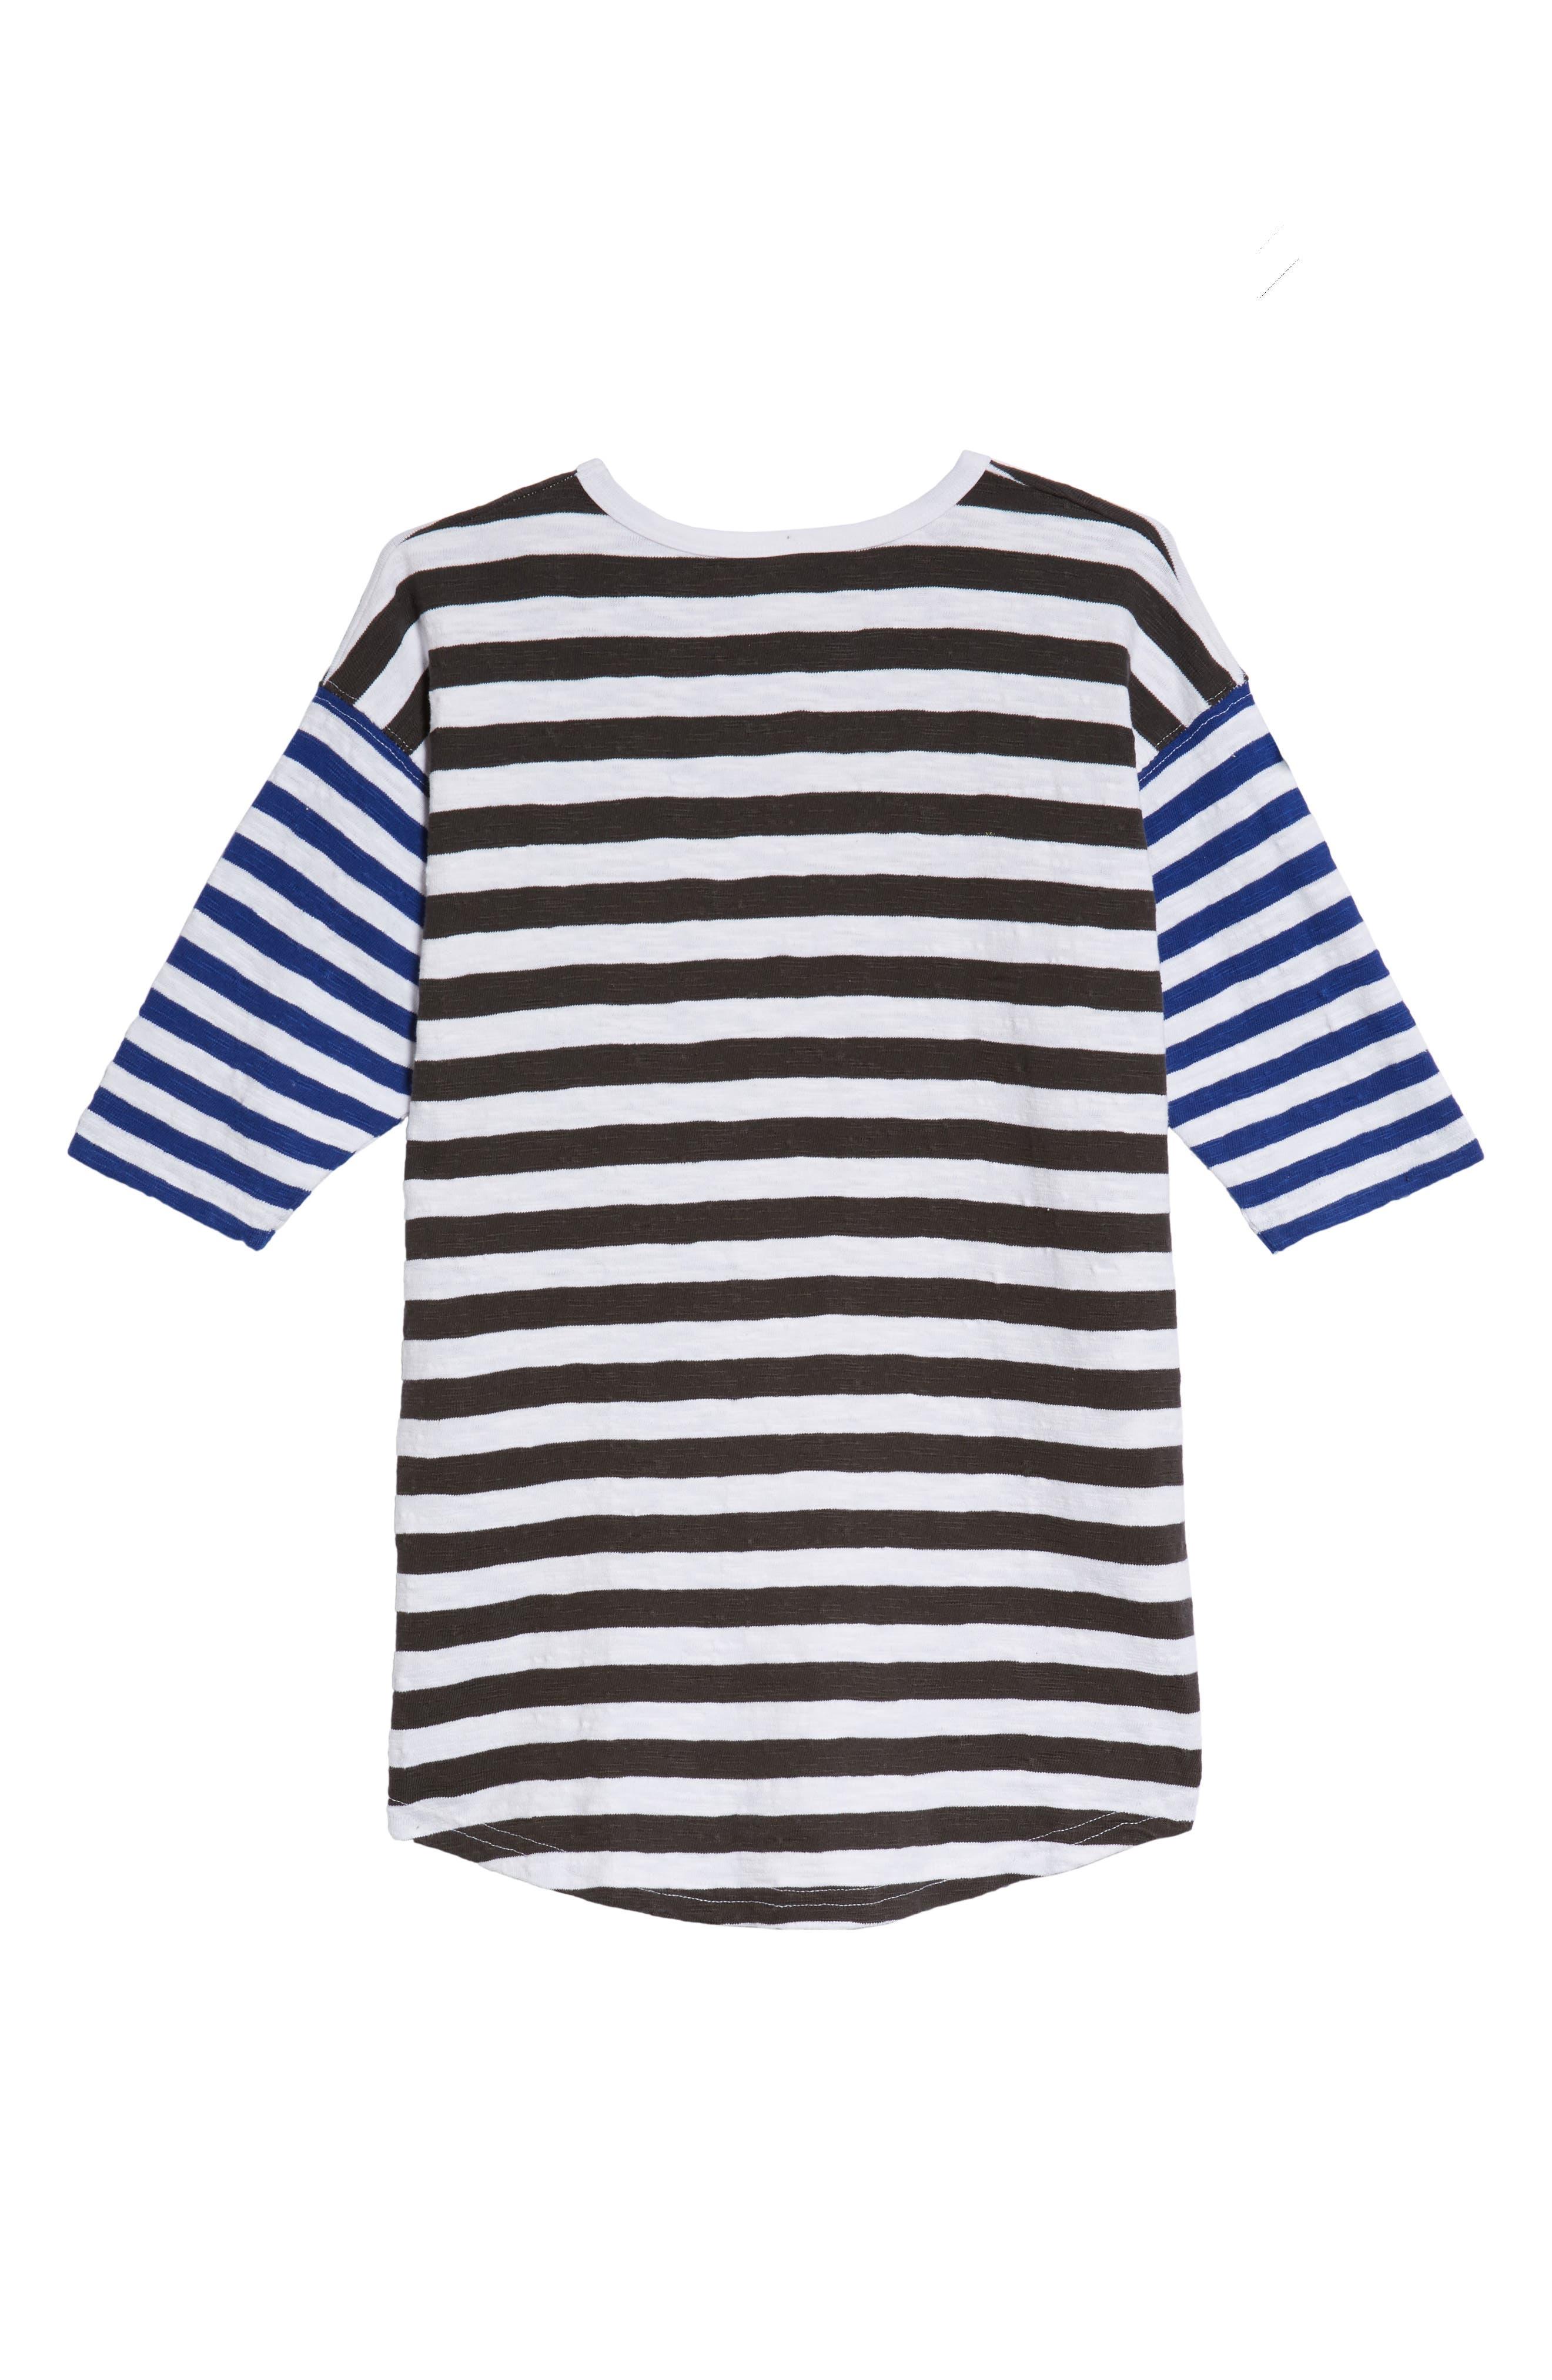 Mixed Stripe Dress,                             Alternate thumbnail 2, color,